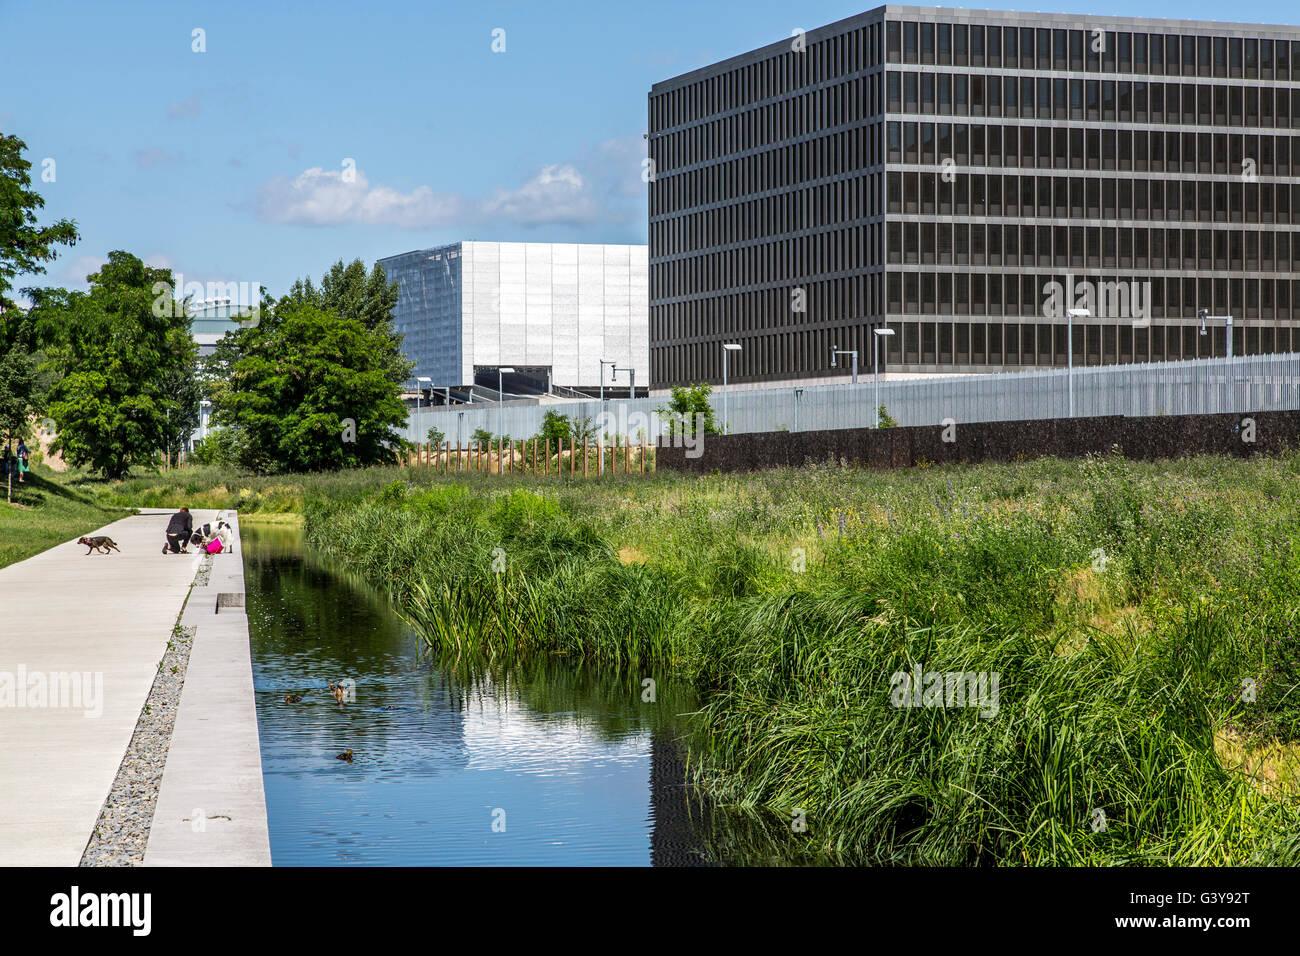 The new headquarter of German foreign secret service, Bundesnachrichtendienst, Berlin, Germany - Stock Image